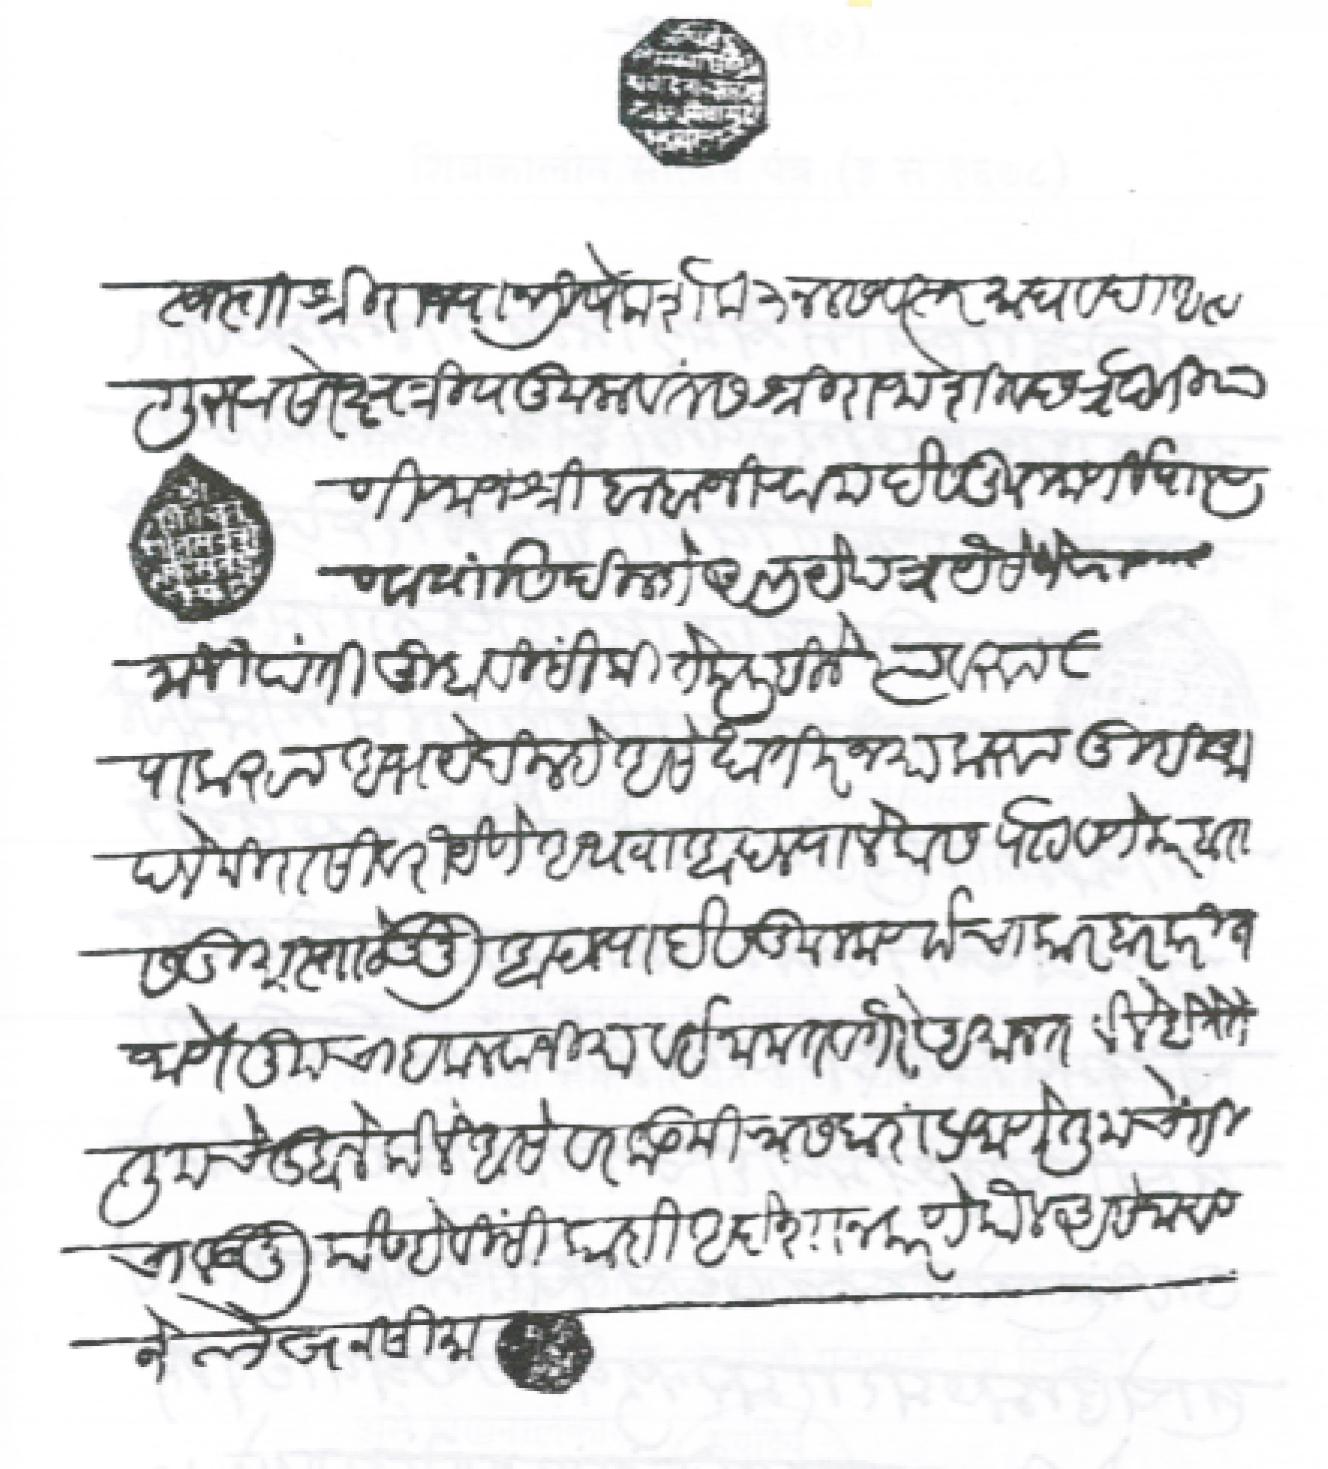 Figure3 Shivakalin Abhayapatra 1677 Chitnisi Writing Style In Modi Script And Second Letter Of Chhatrapati Rajaram Aadhnyapatra 1695